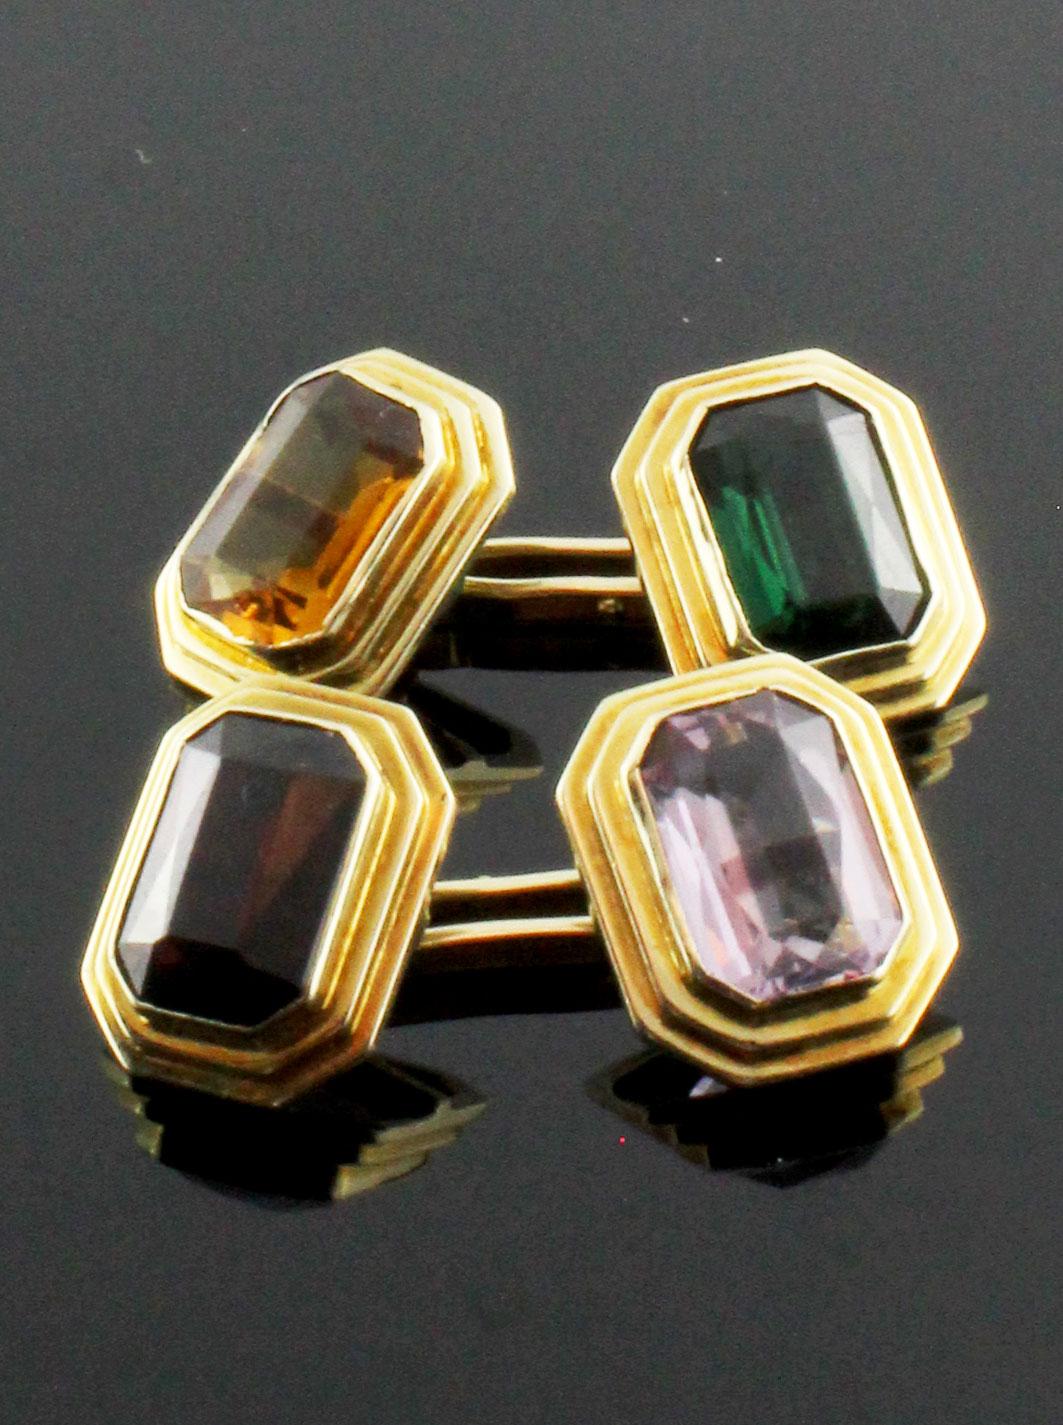 Colorful octagonal cufflinks